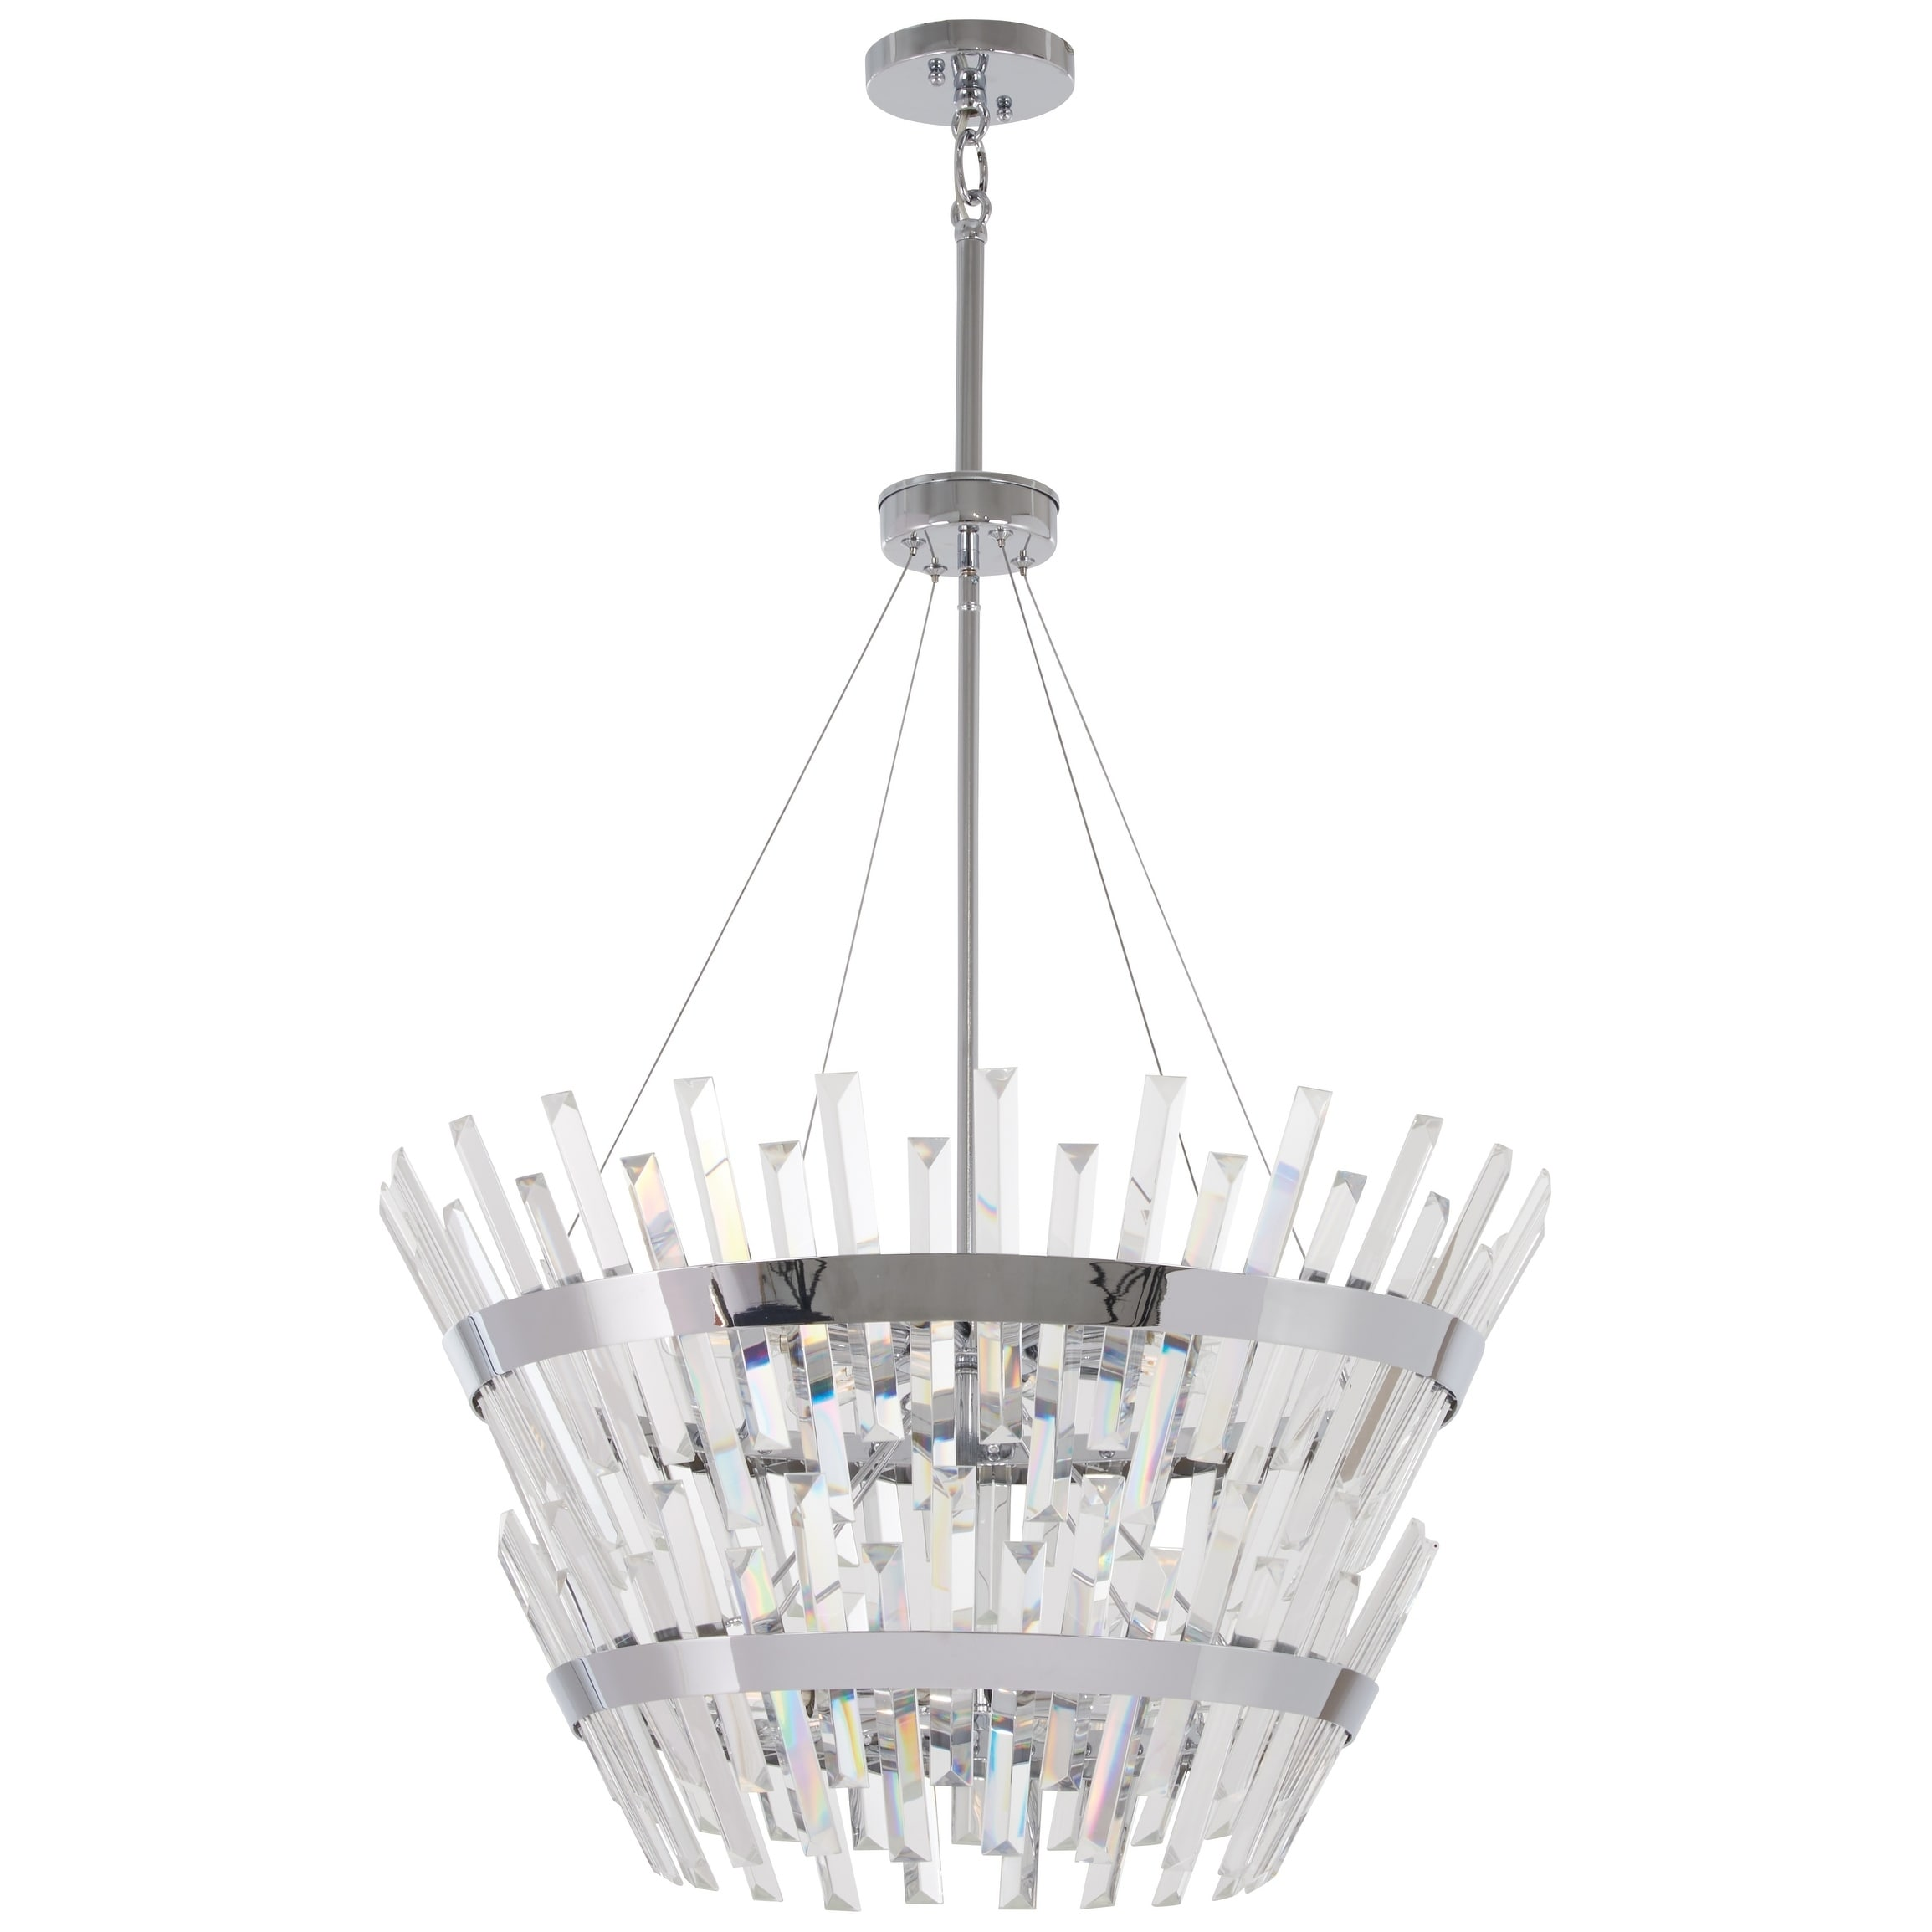 Echo Radiance Chrome 14 Light Chandelier By Minka Lavery Chandelier Lighting Chandelier Glass Shades